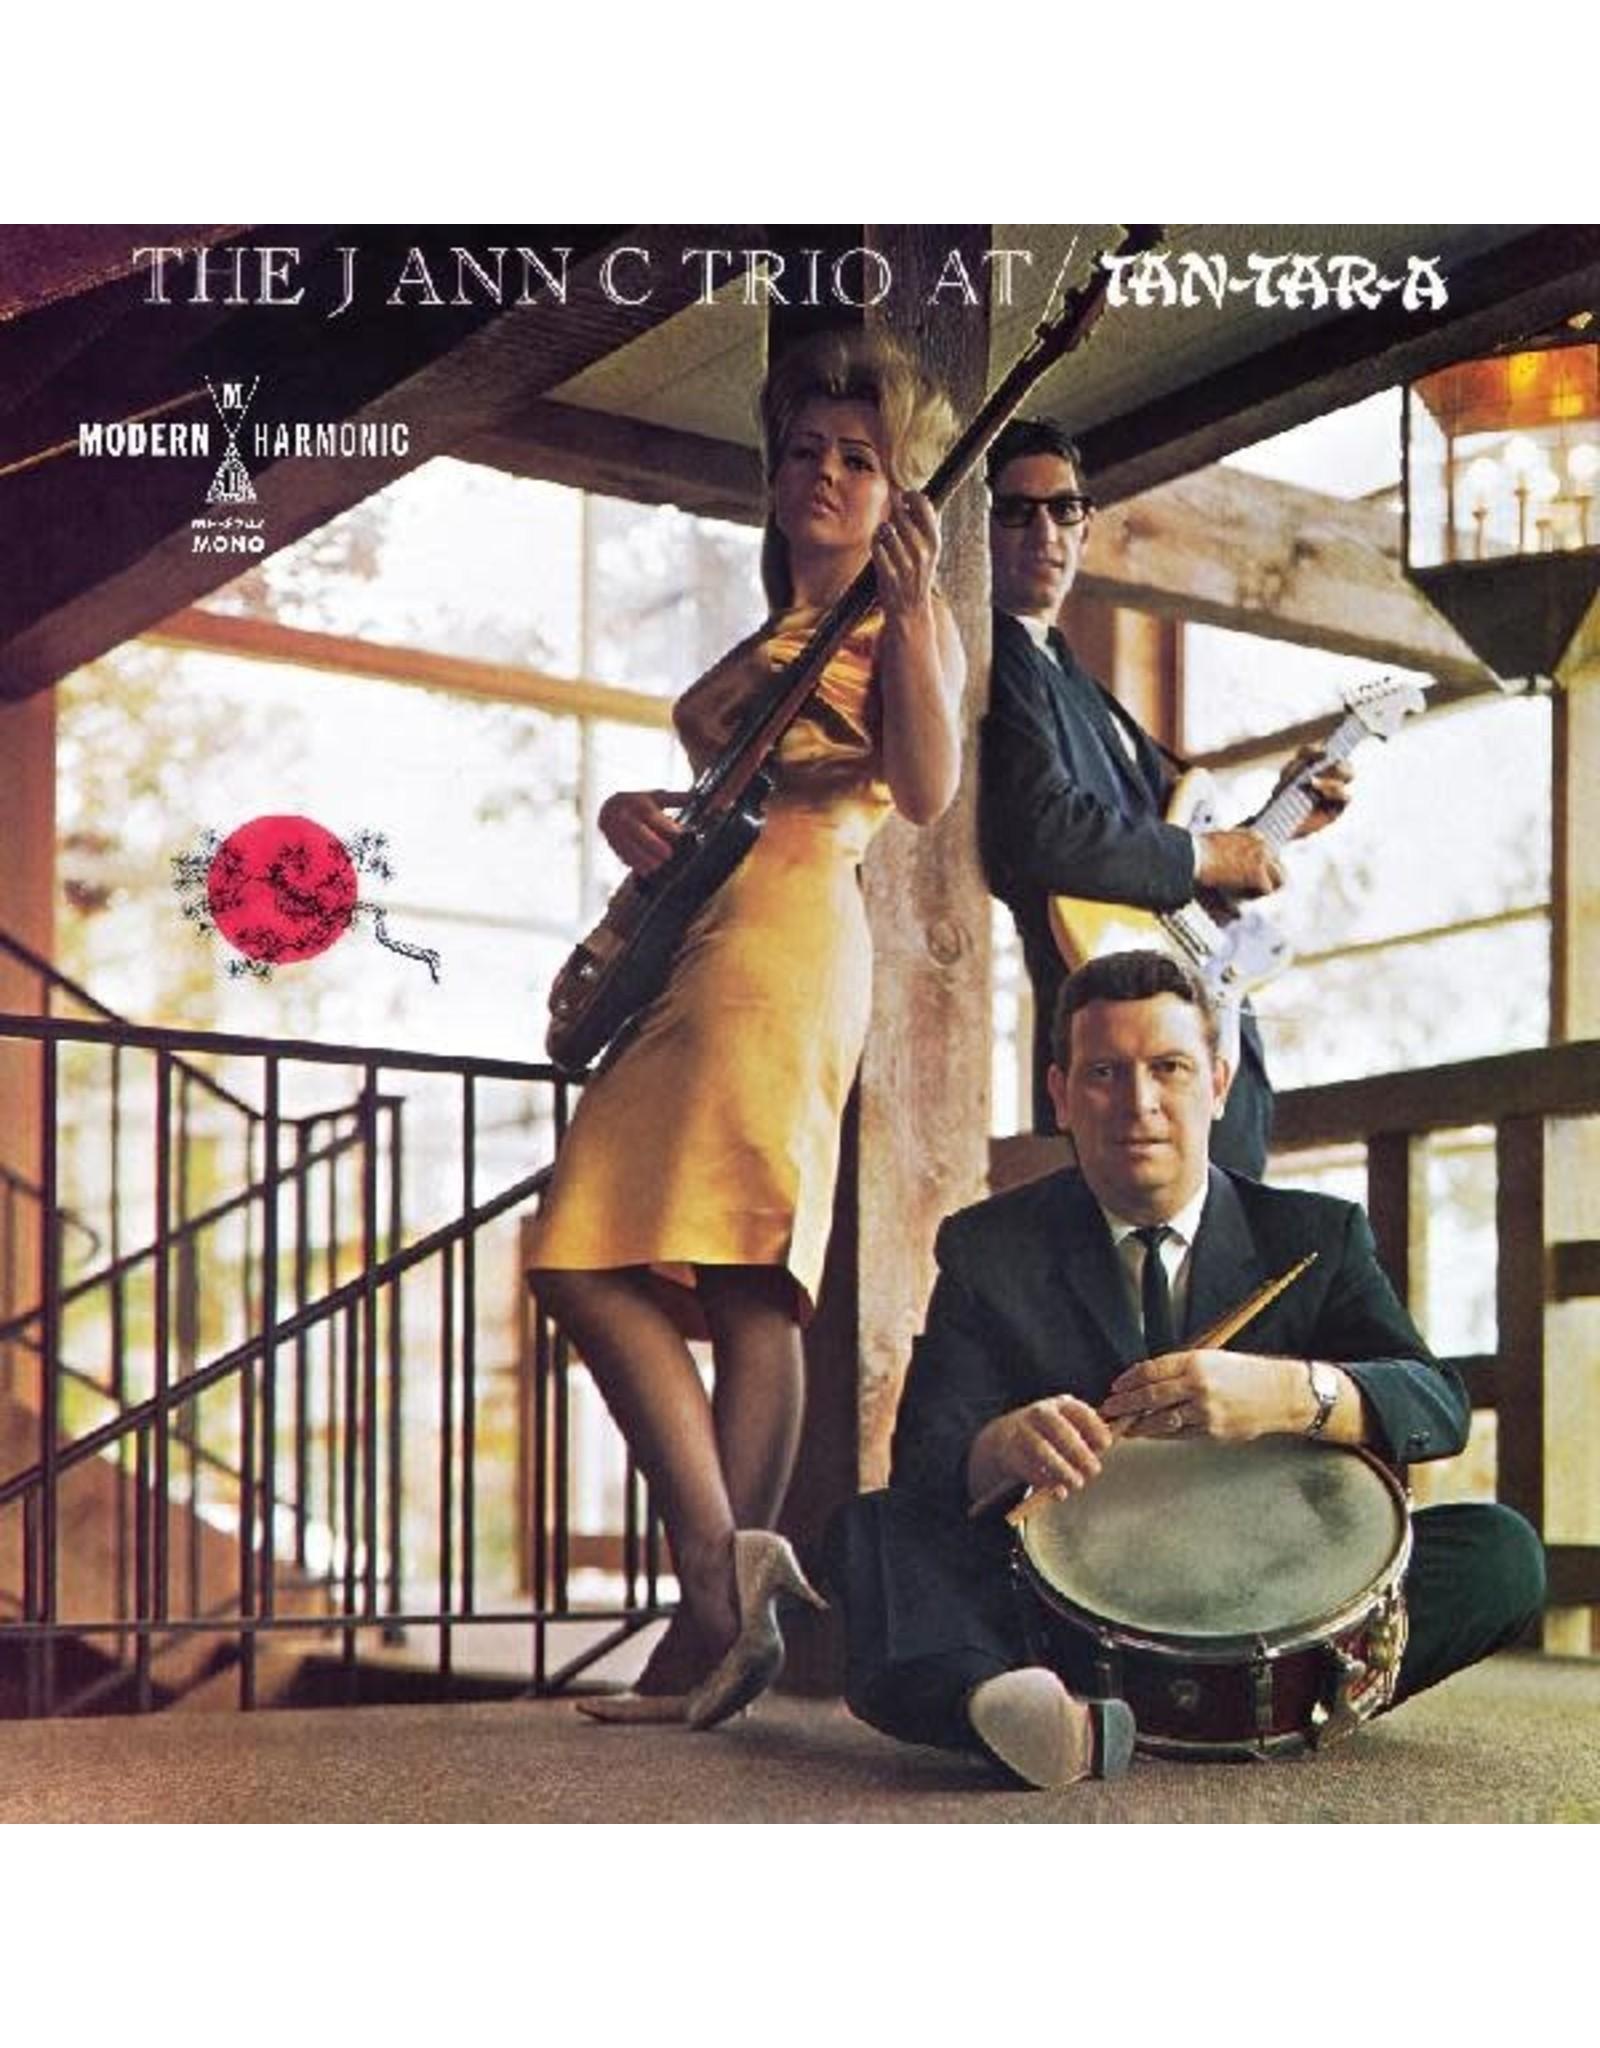 New Vinyl The J Ann C Trio - At The Tan-Tar-A LP